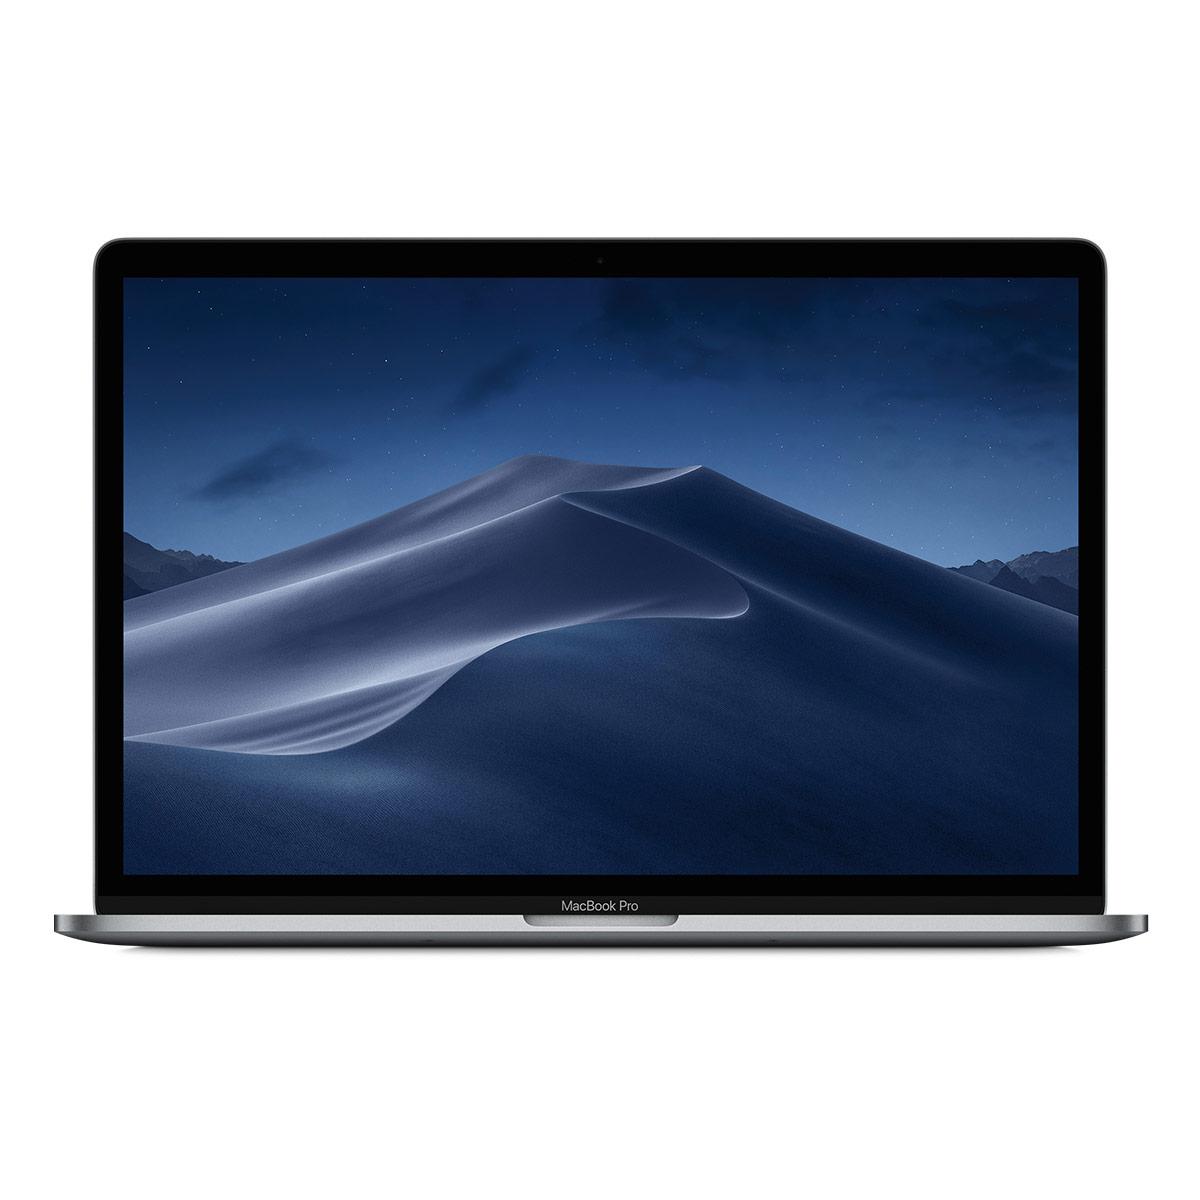 "MacBook Pro 15"" TouchBar 8-core i9 2.3GHz 16GB 512GB 560X Space Grey"